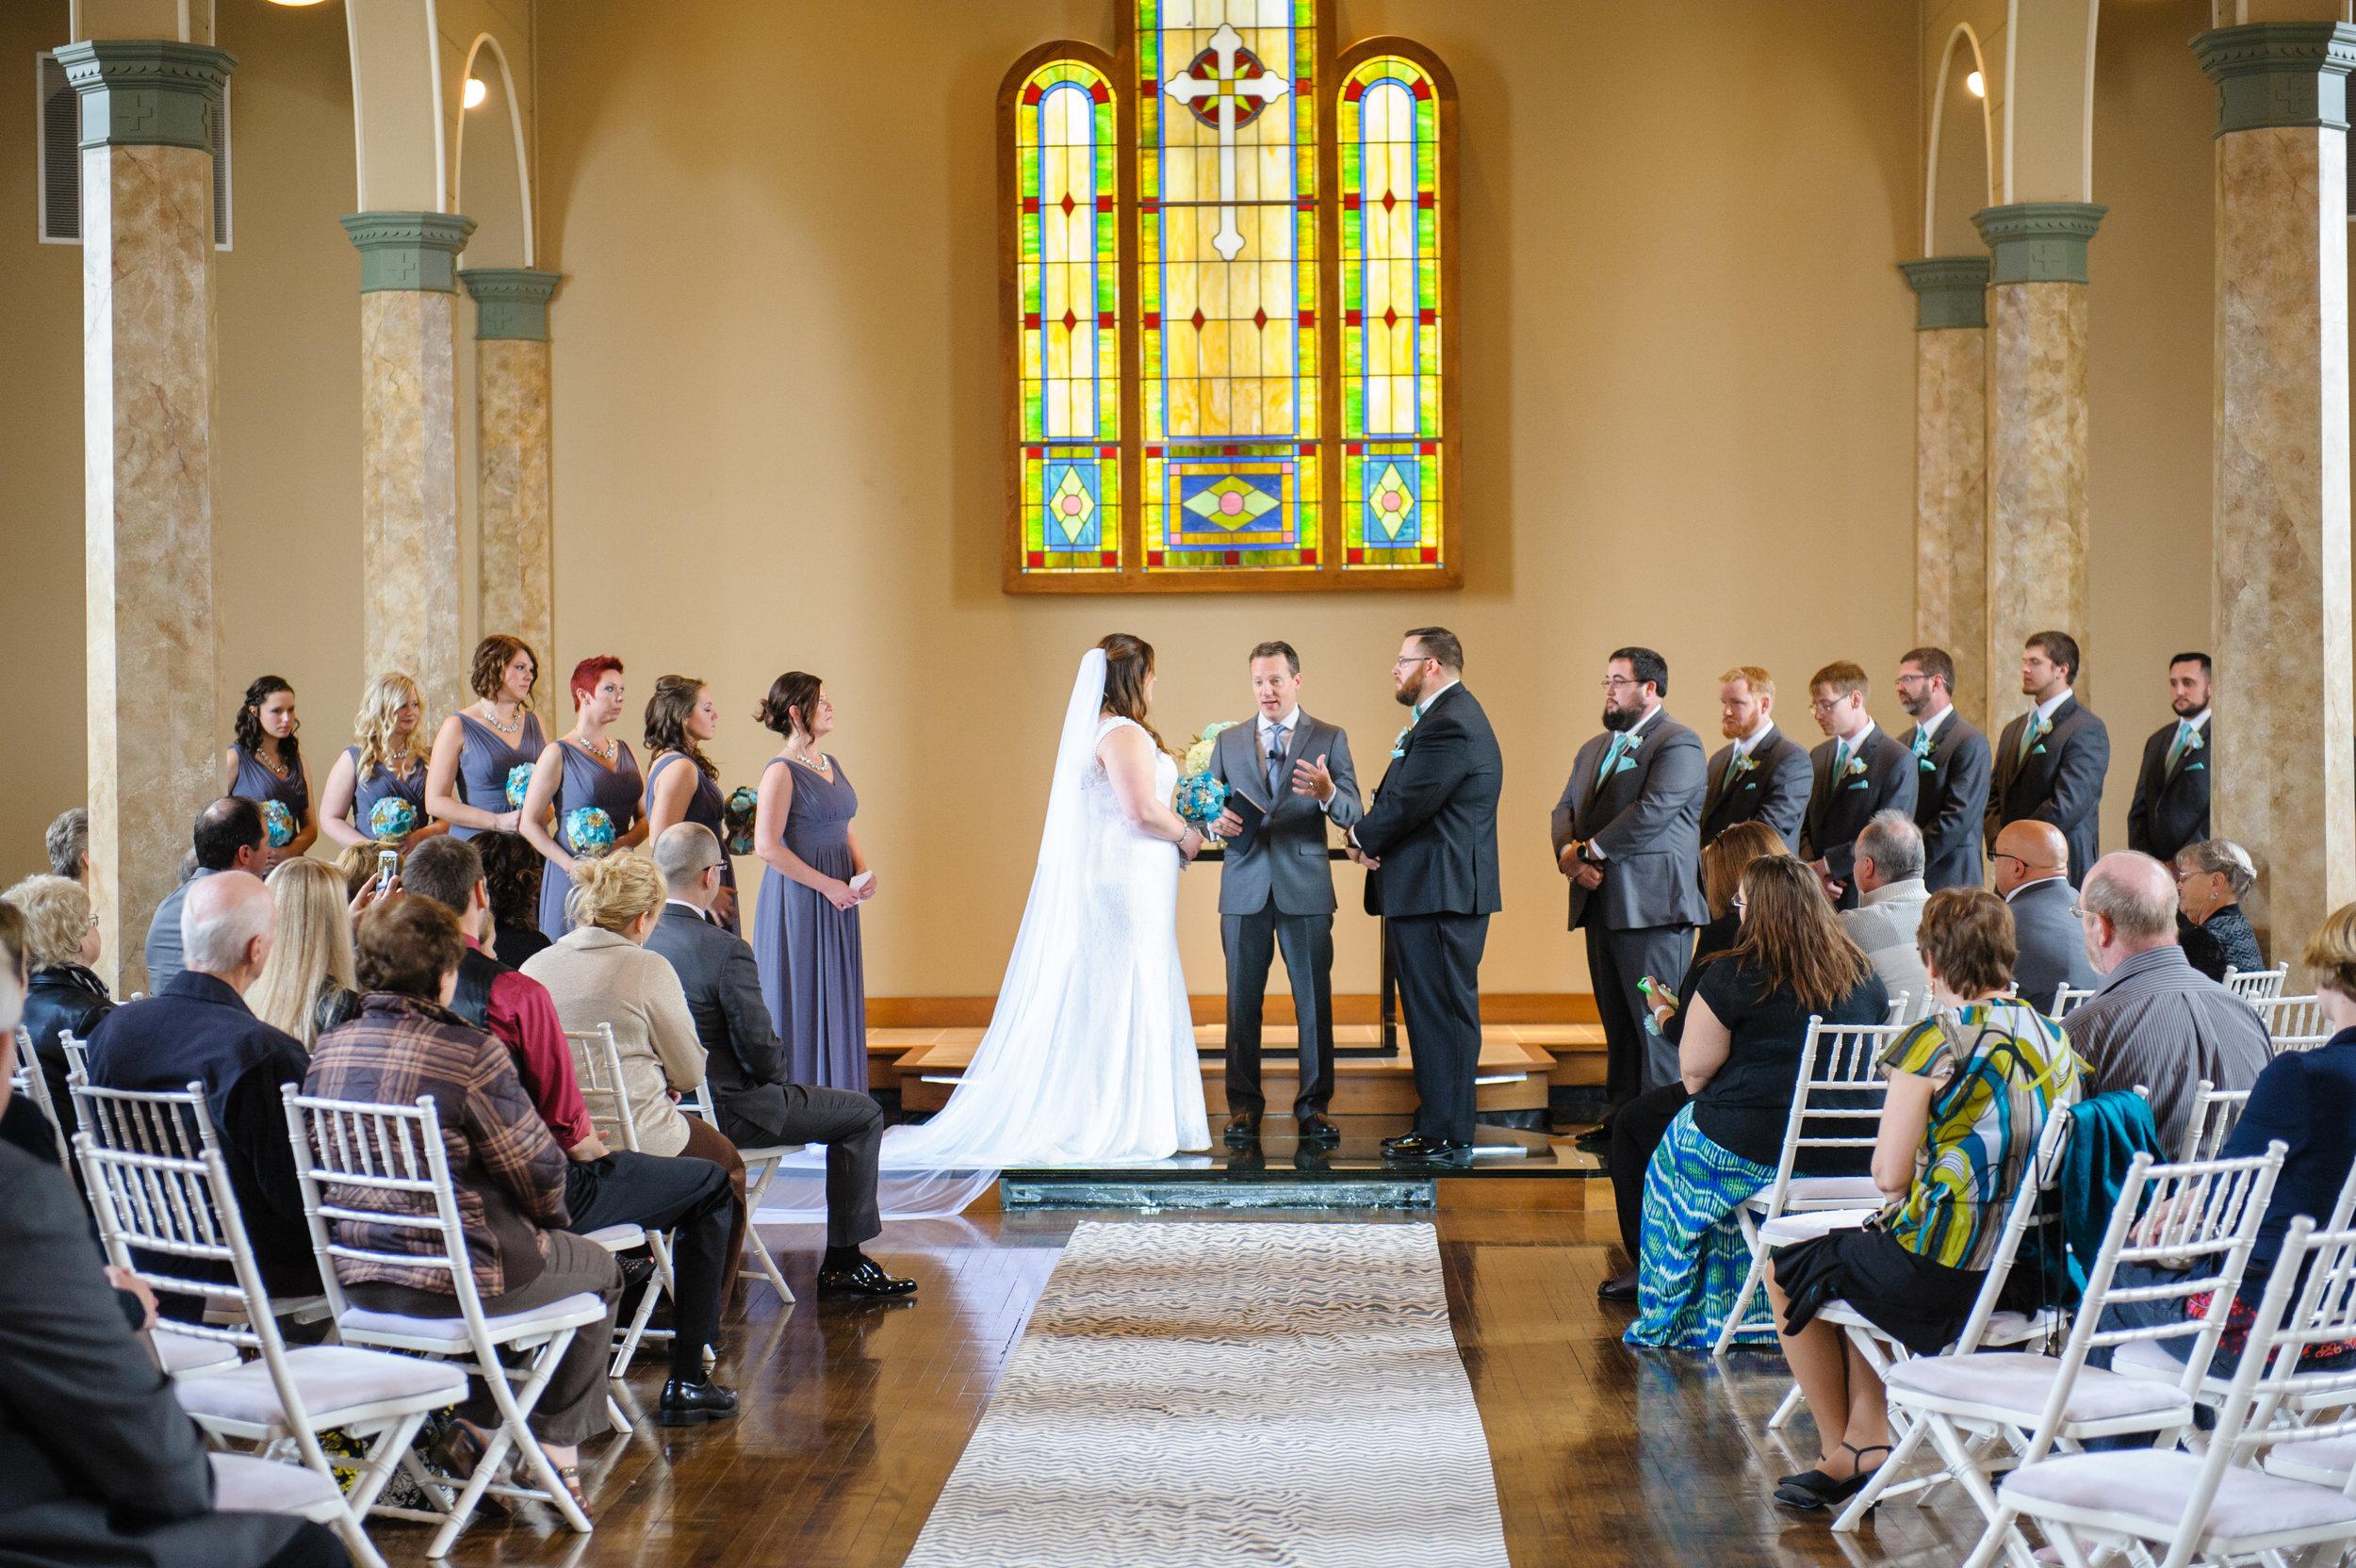 Tim Sorbo Wisconsin Wedding Officiant